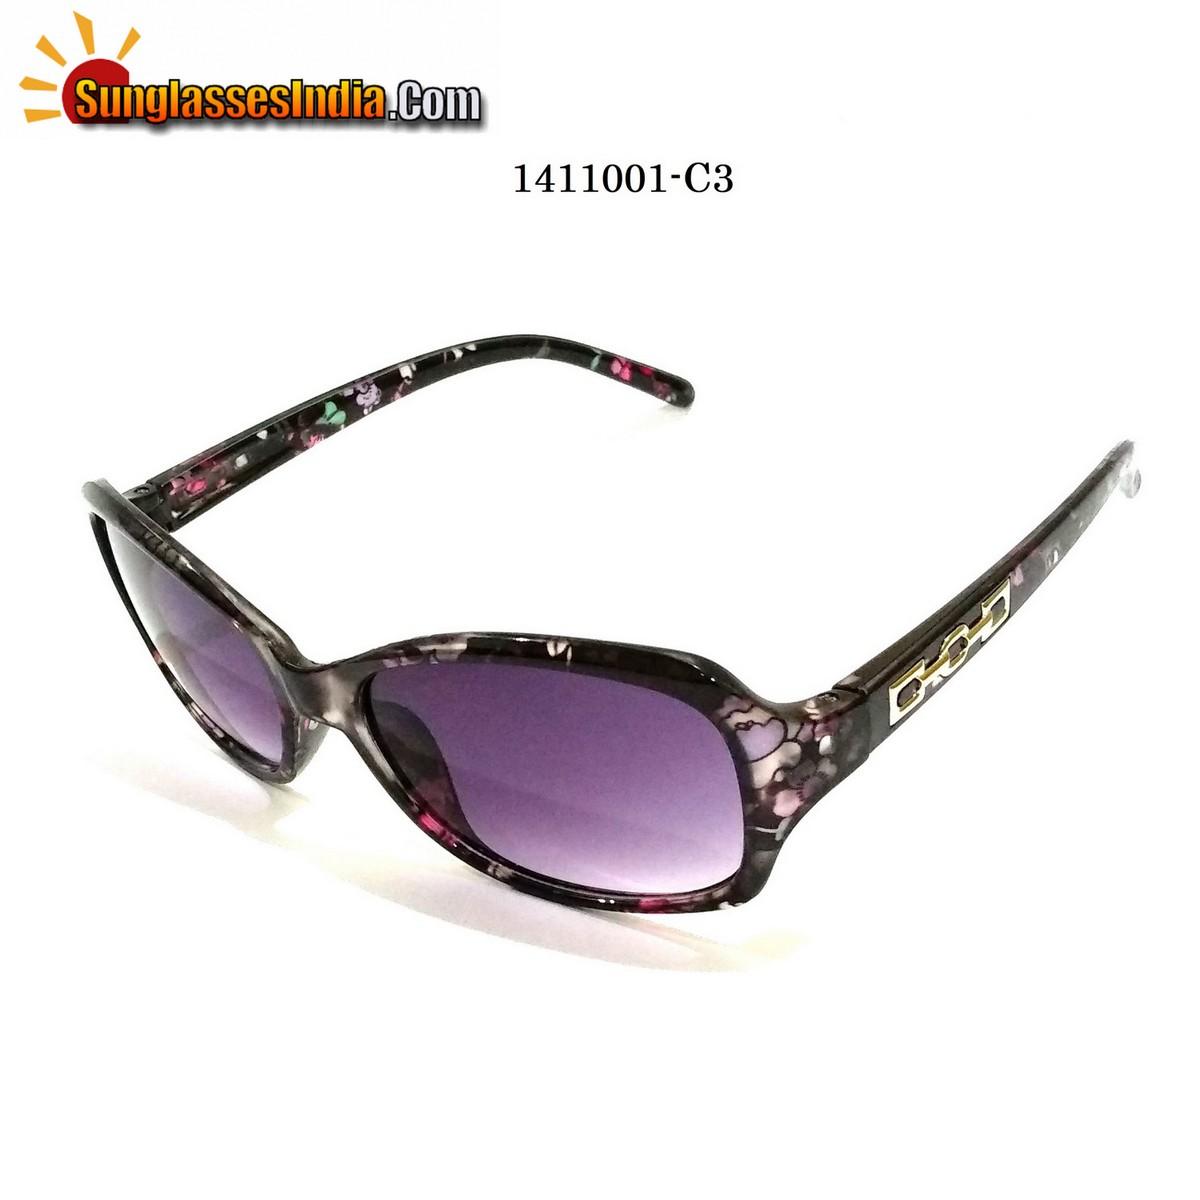 Floral Print Ladies Women Sunglasses Model 1141001C3